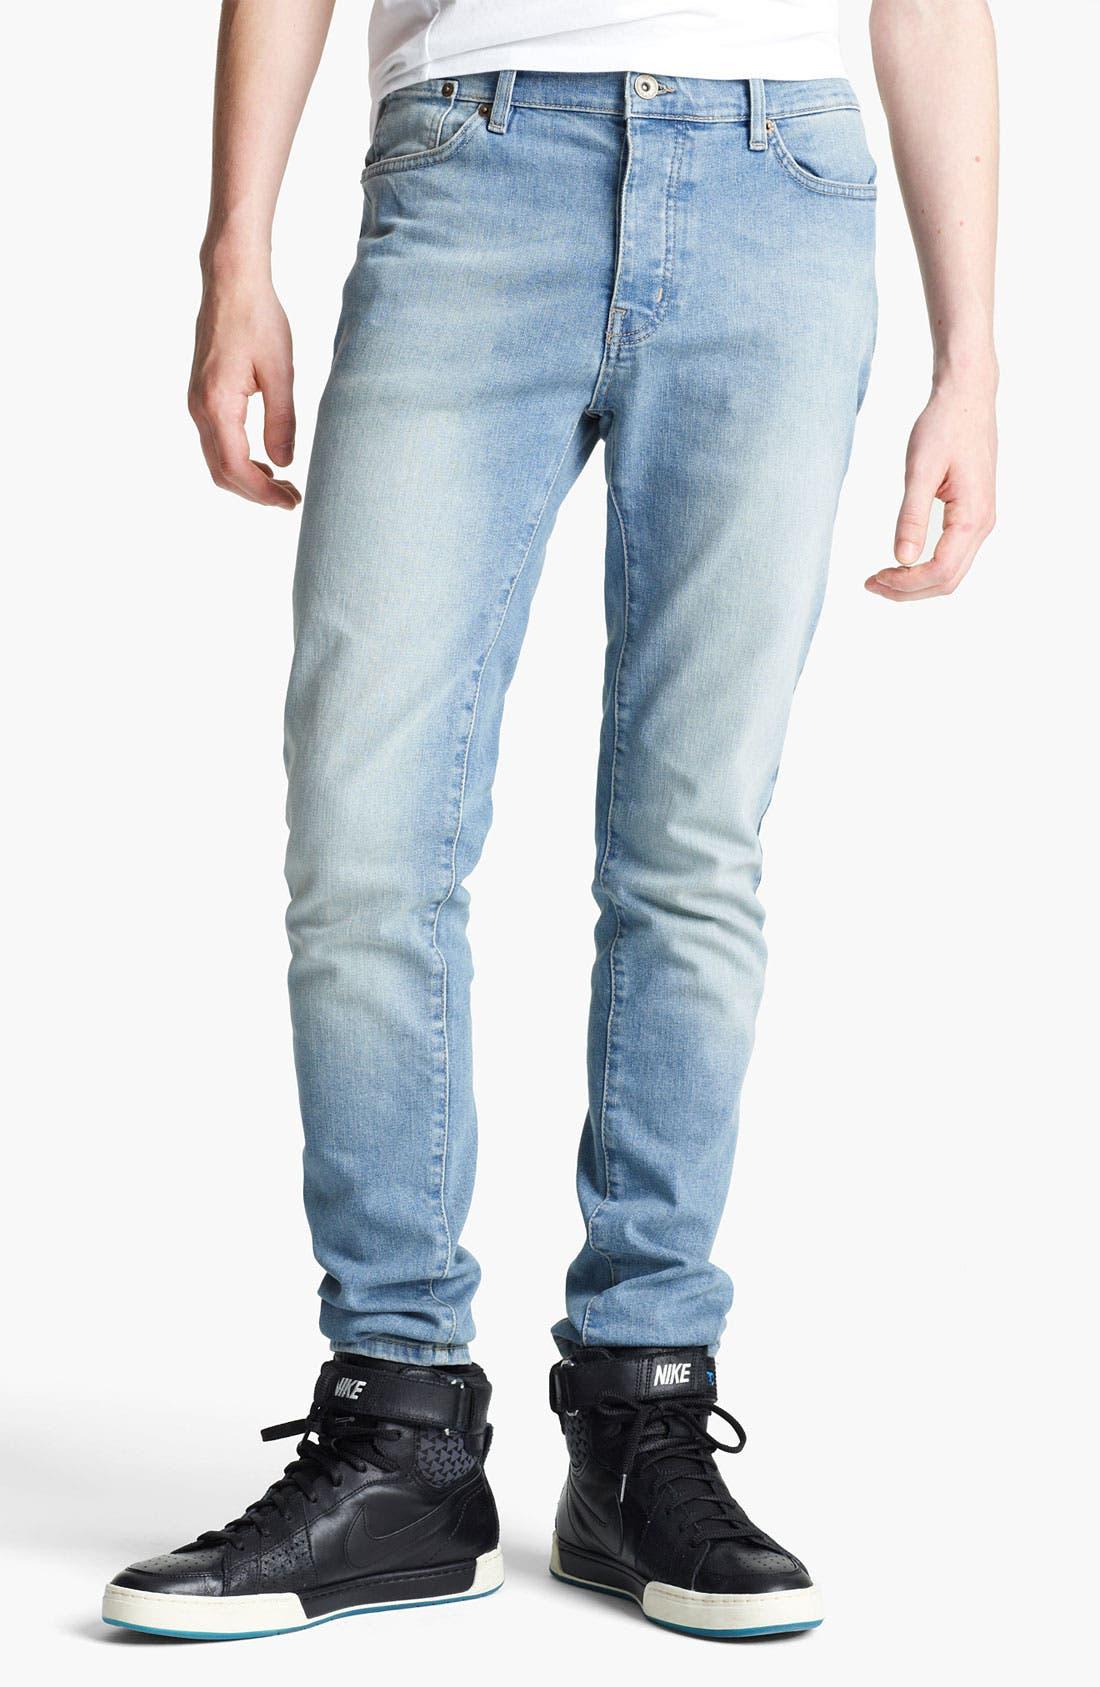 Alternate Image 1 Selected - Topman 'Lome' Skinny Jeans (Light)